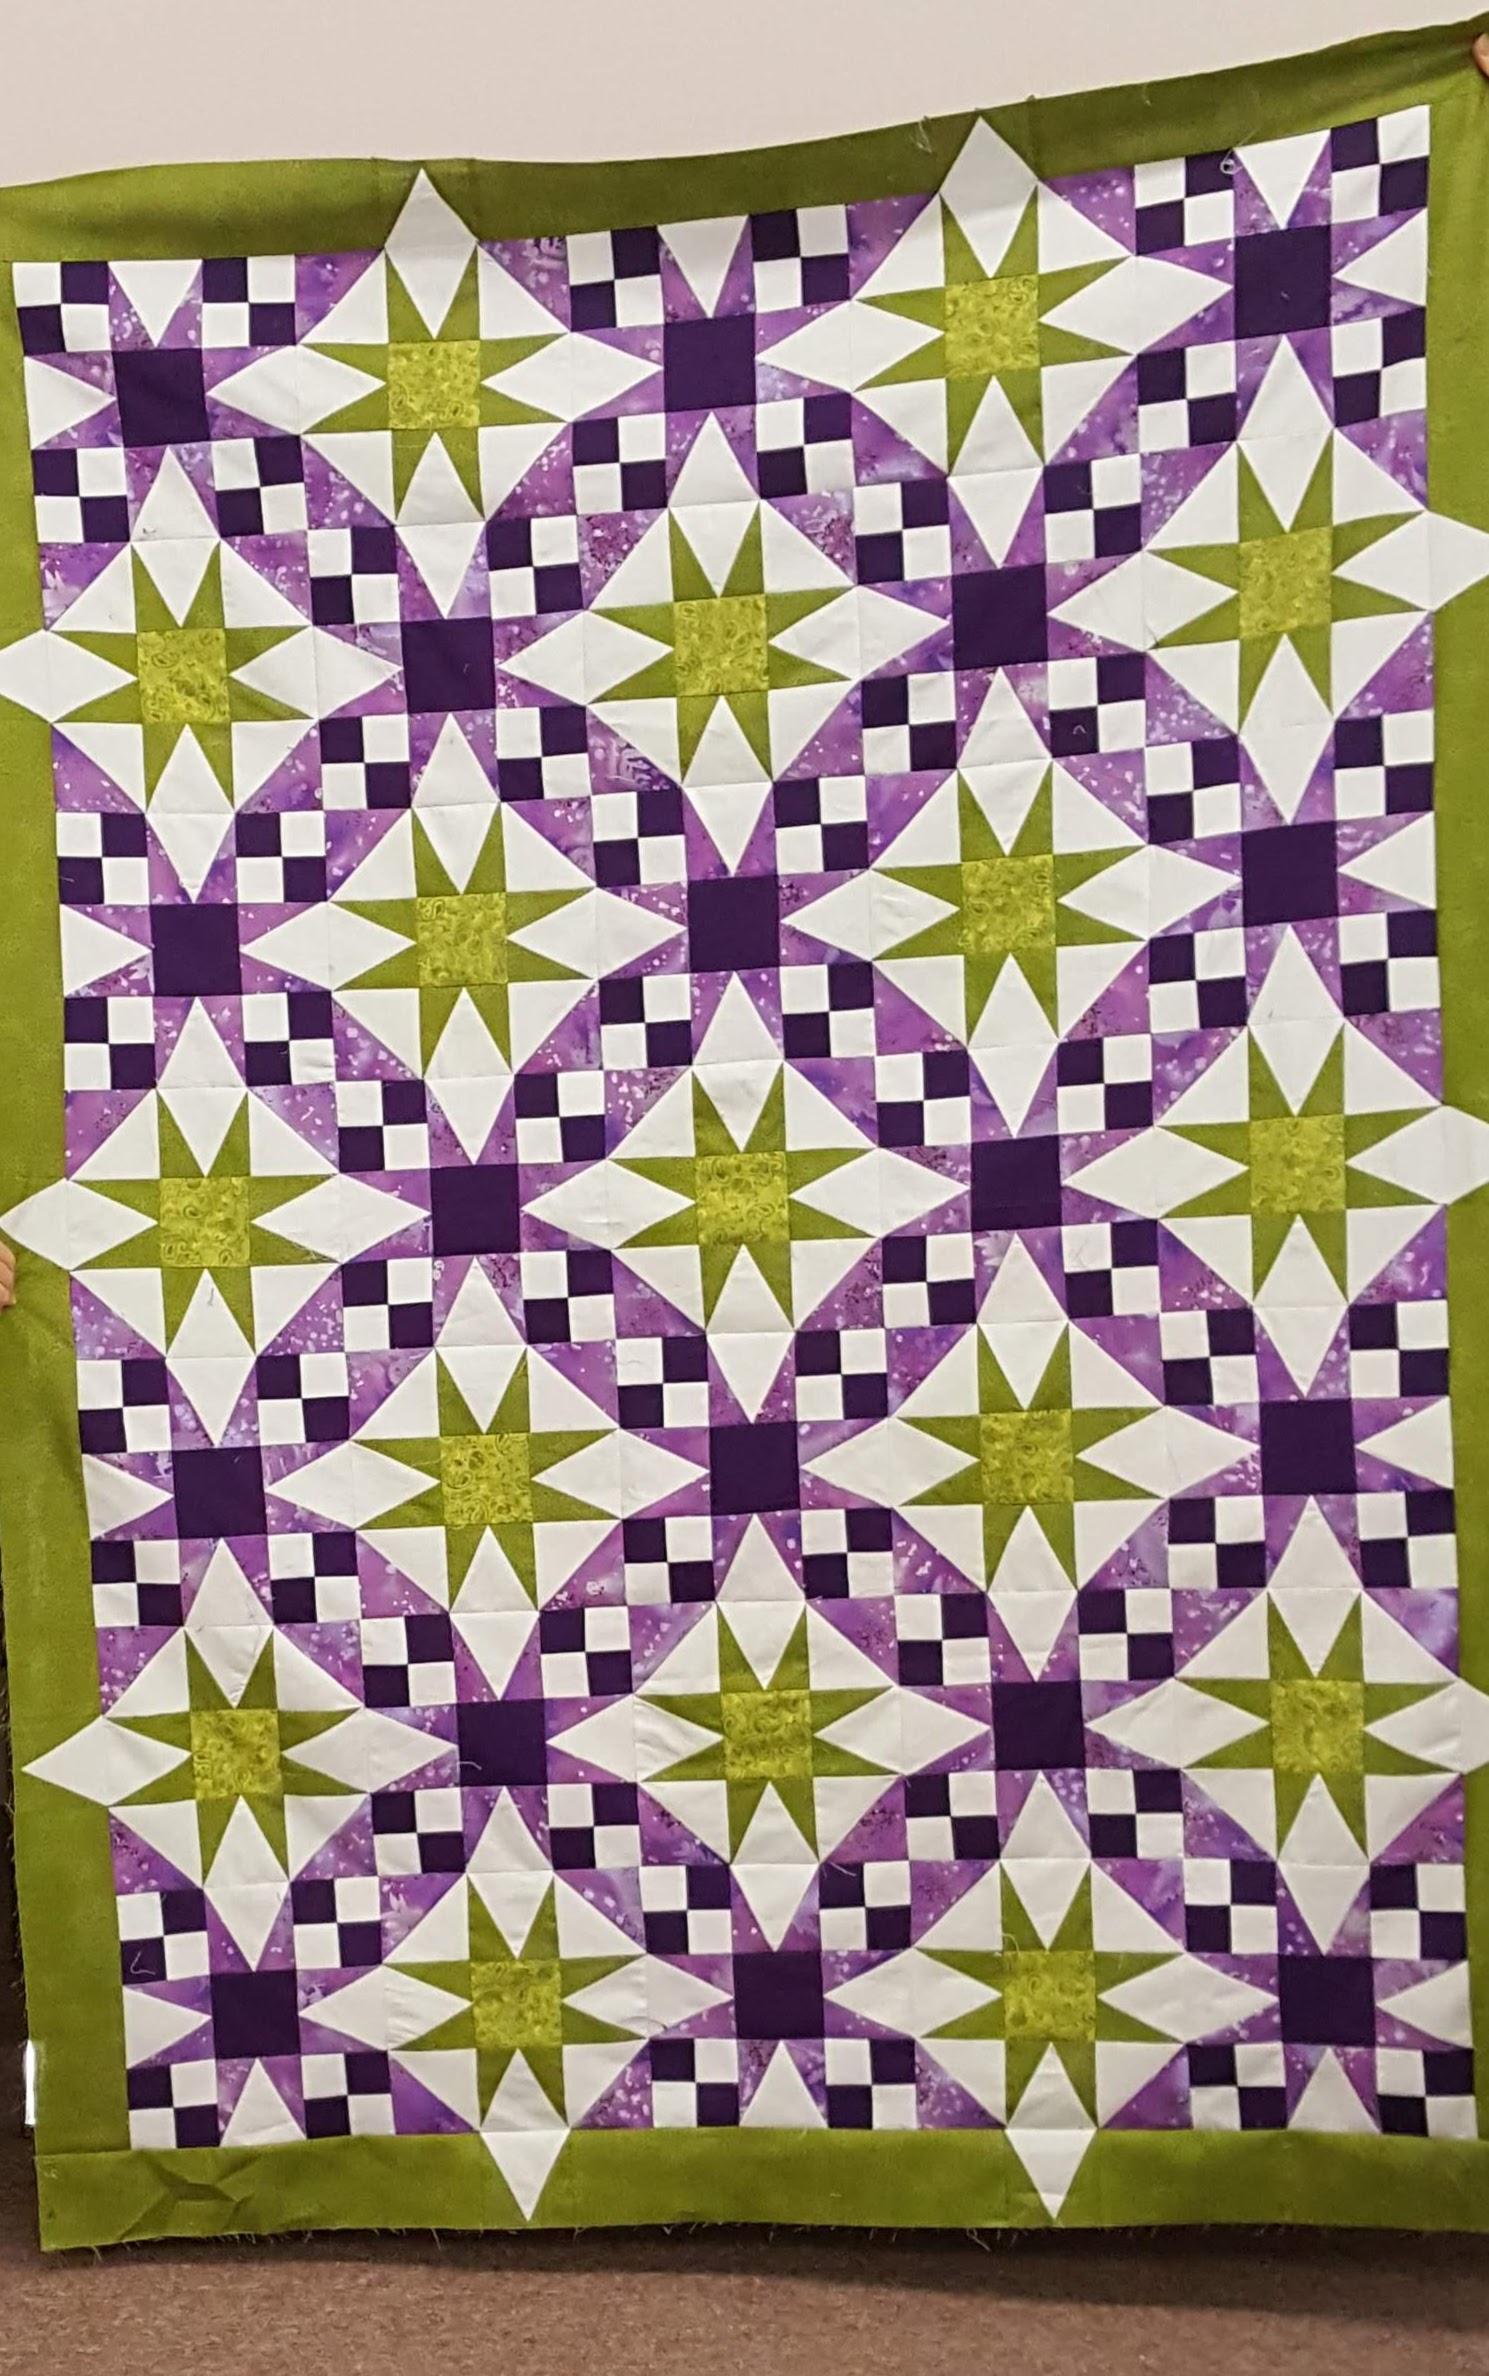 Yvonne purple-and-green-galaxy-quilt.jpg